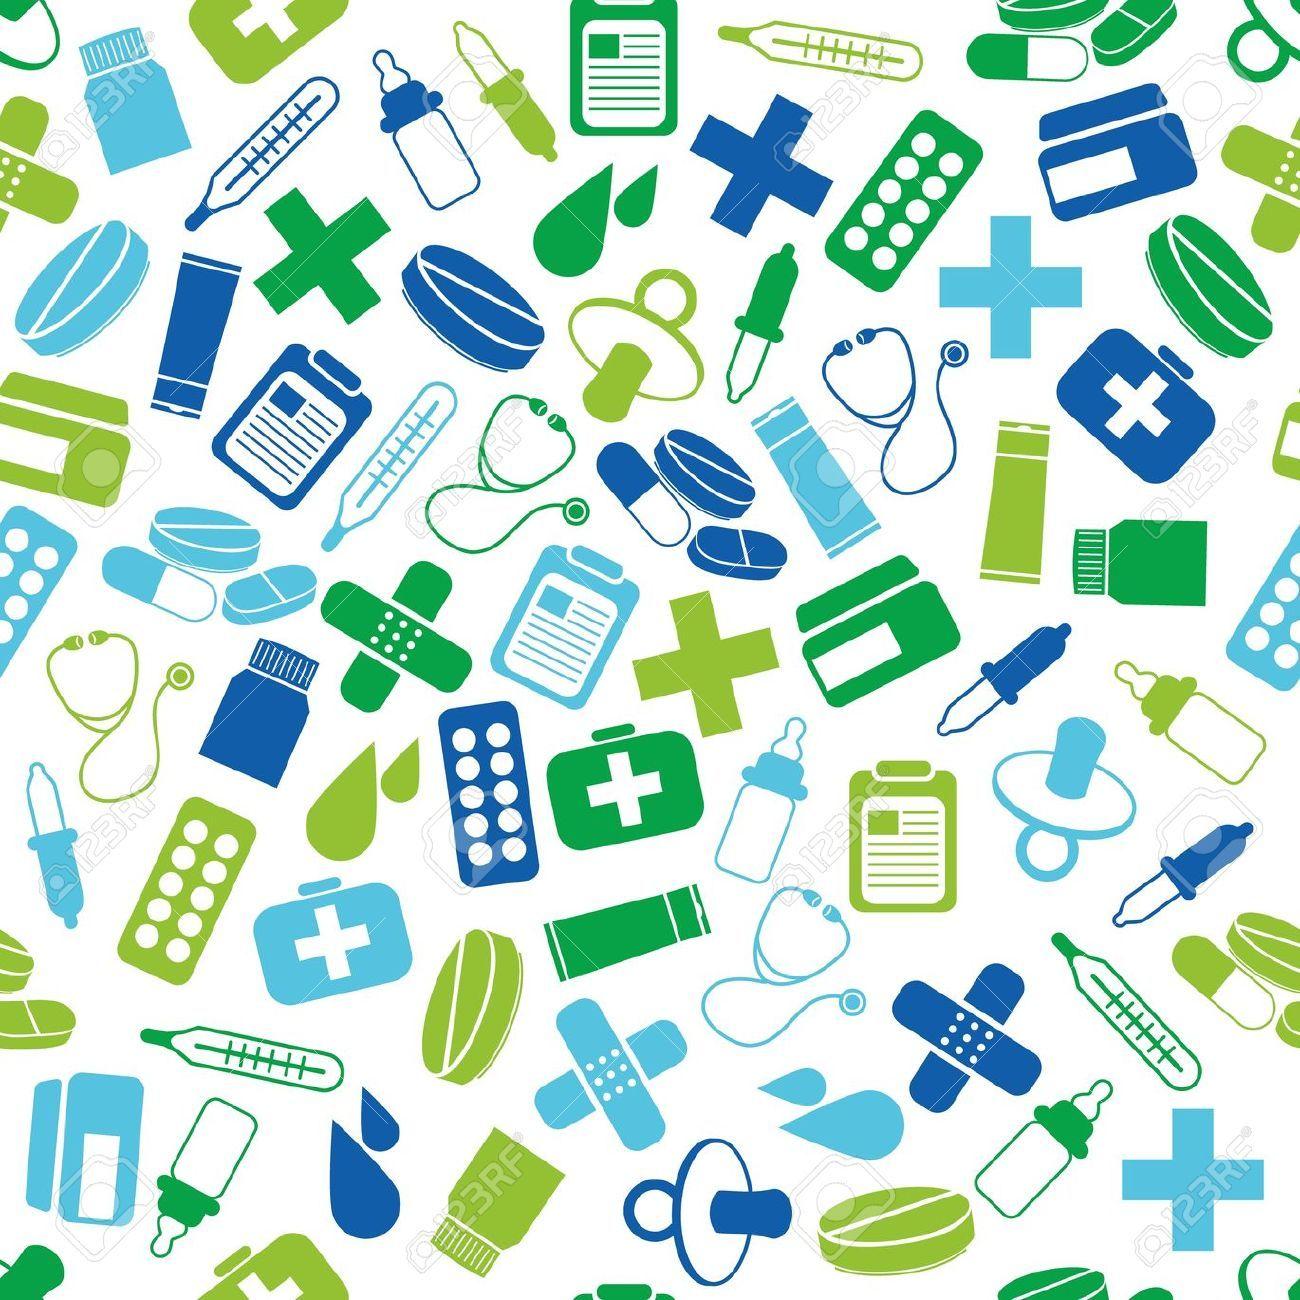 medicina vintqage - Buscar con Google